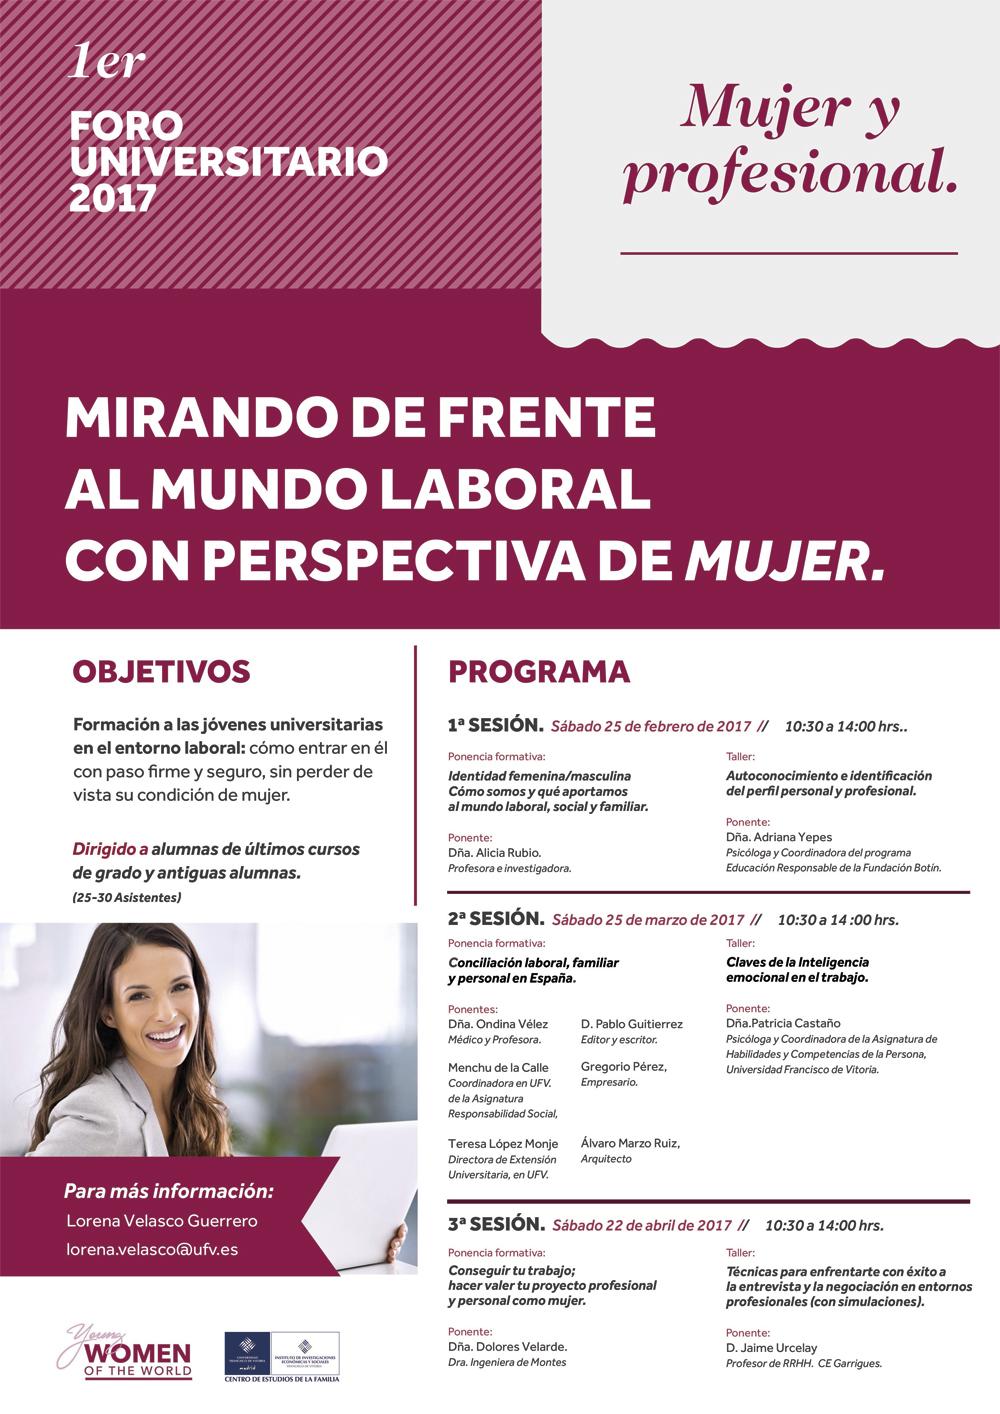 Primer Foro Universitario 2017